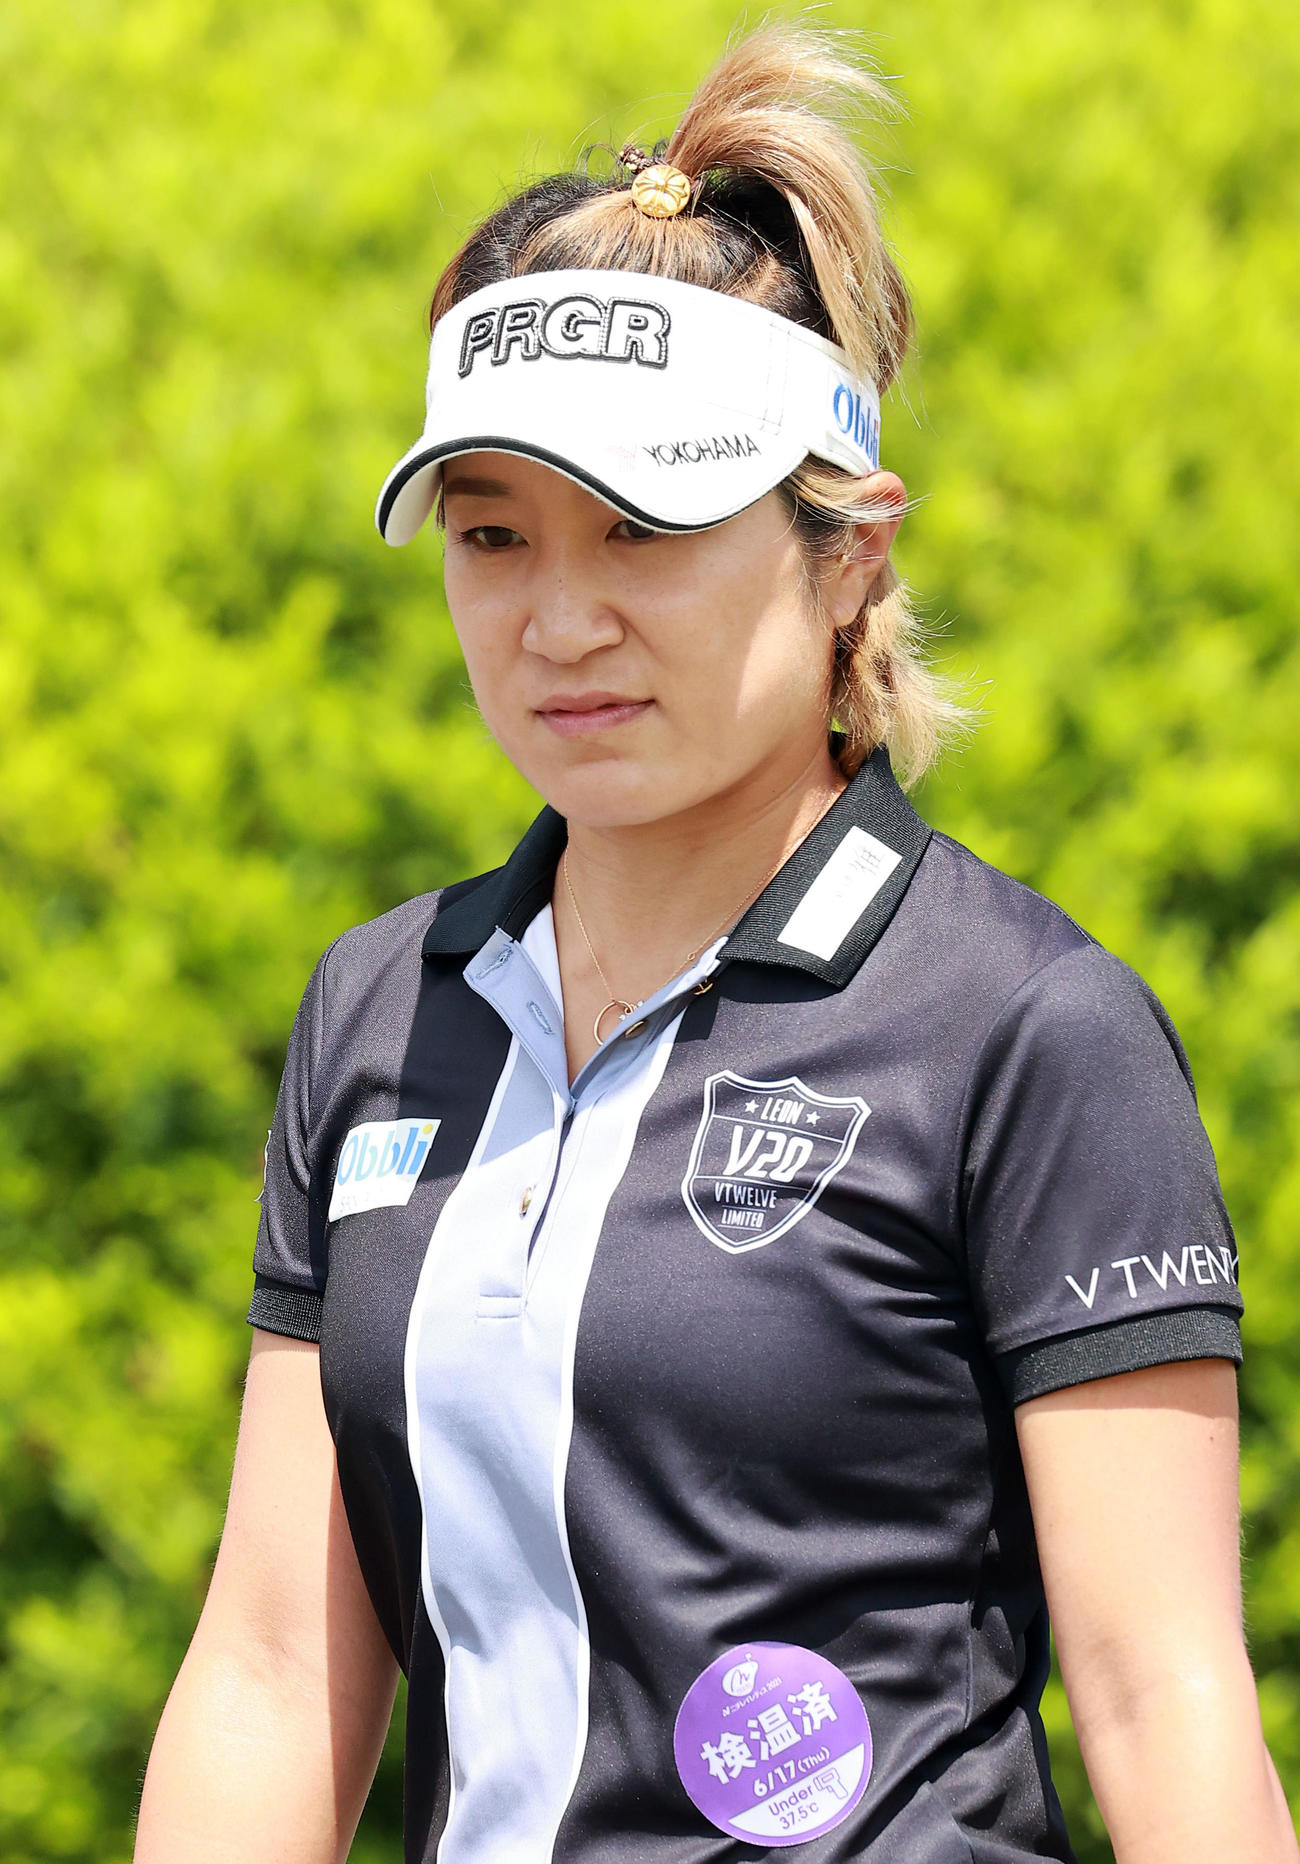 https://www.nikkansports.com/sports/golf/news/img/202106170000317-w1300_13.jpg